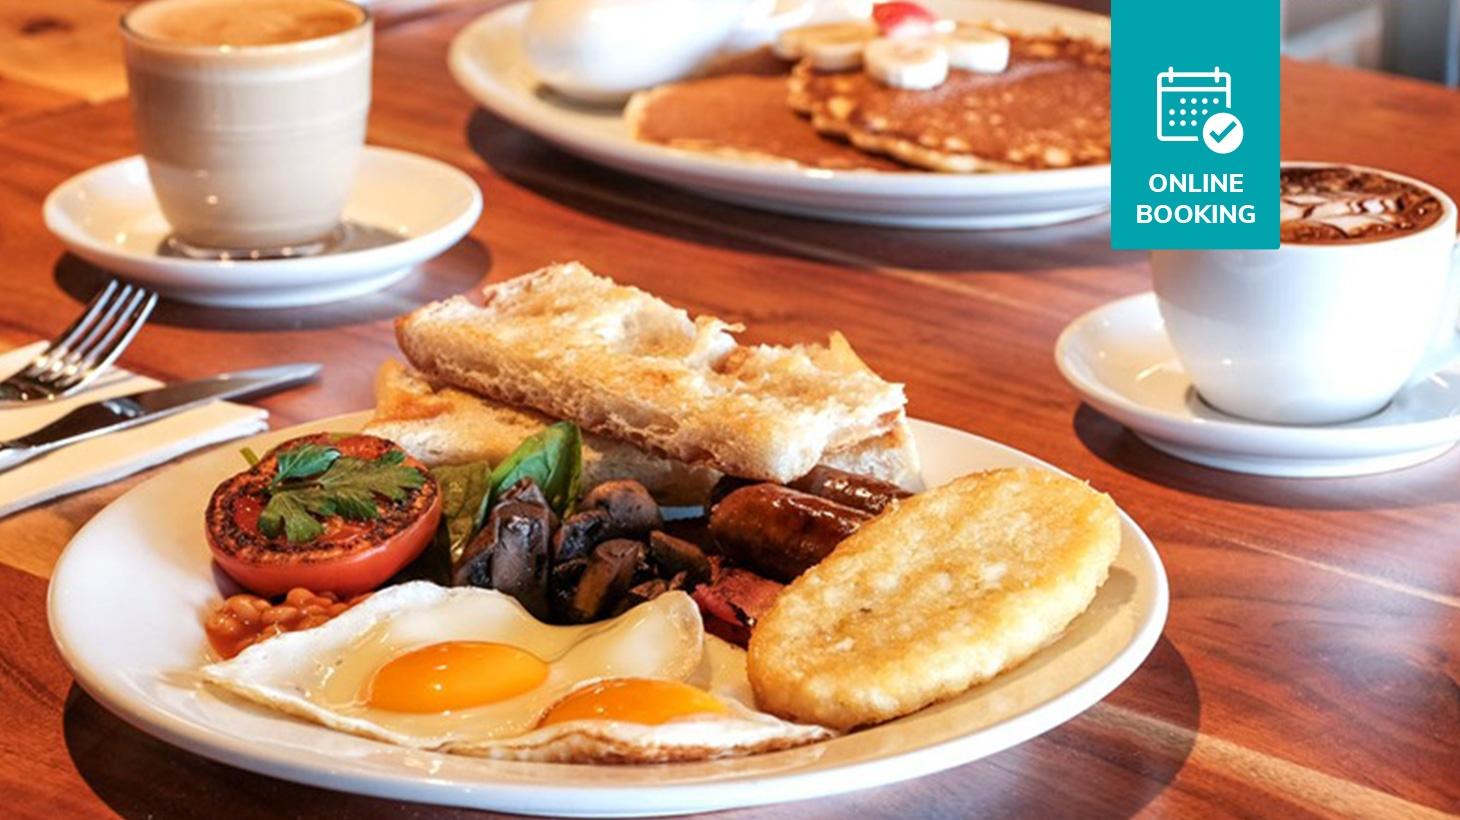 Waterfront Breakfast in Mandurah with Barista-Made Coffee